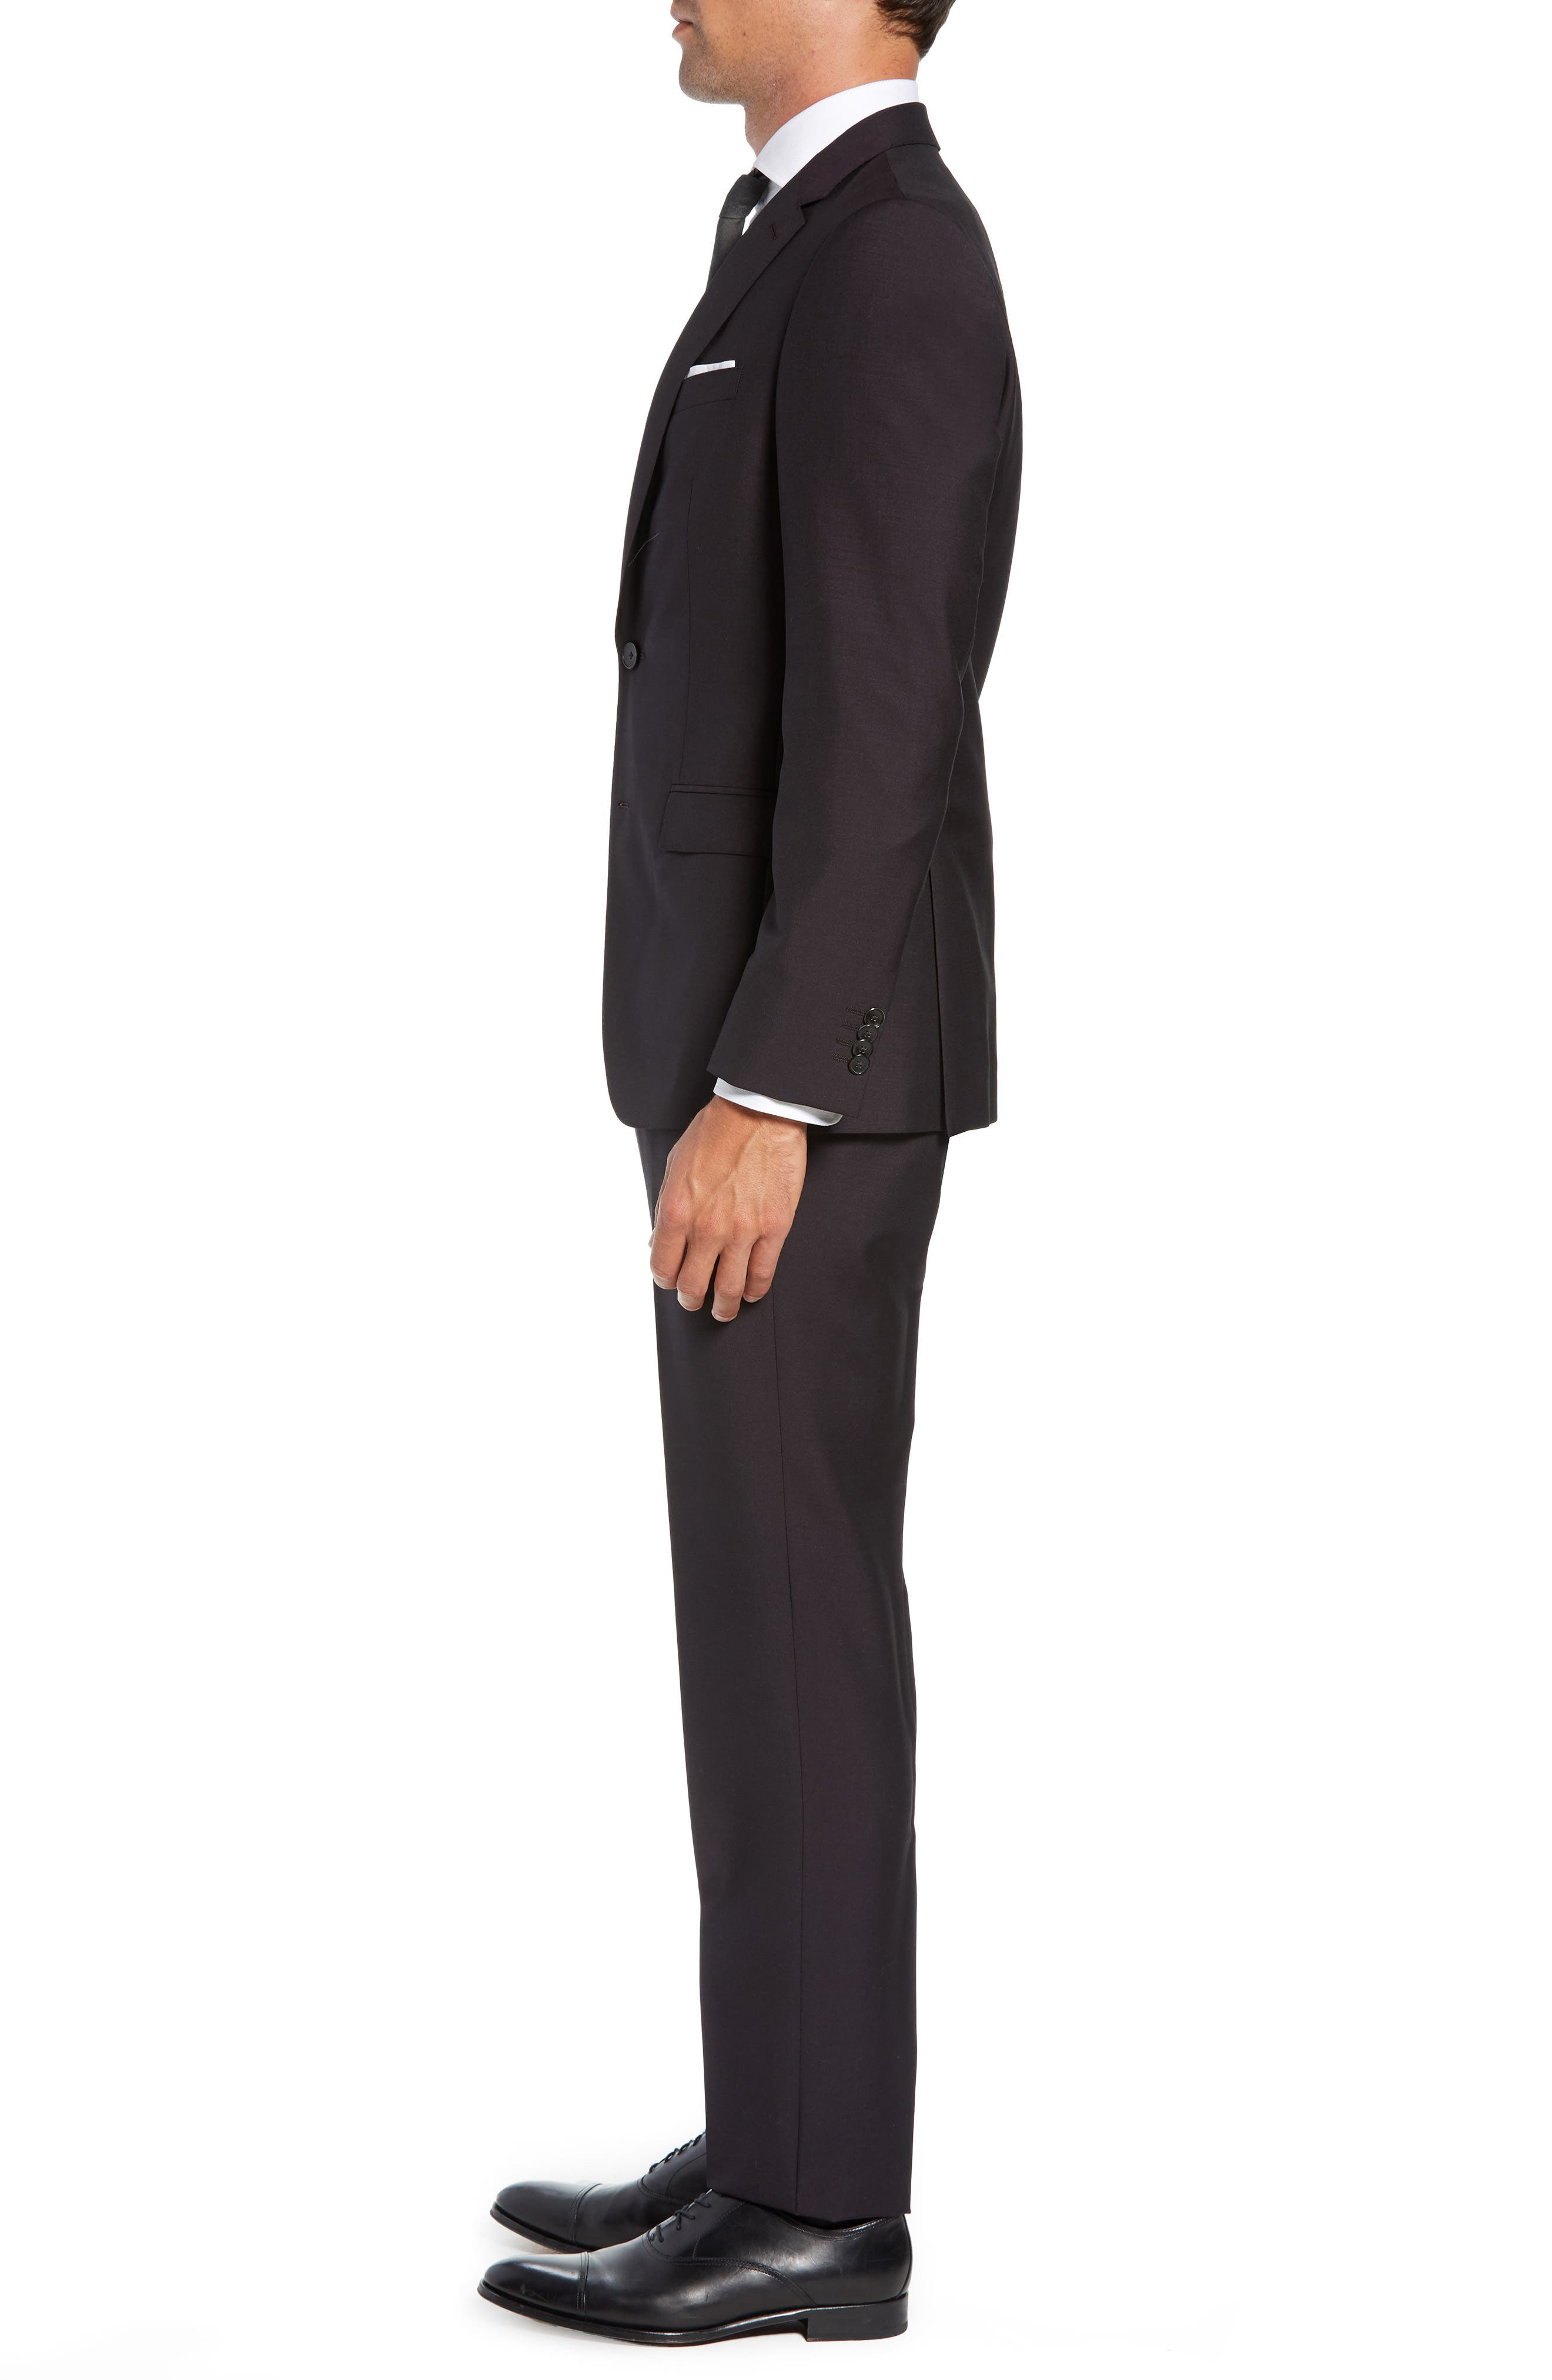 Novan/Ben Trim Fit Solid Wool & Mohair Suit,                             Alternate thumbnail 3, color,                             DARK PURPLE